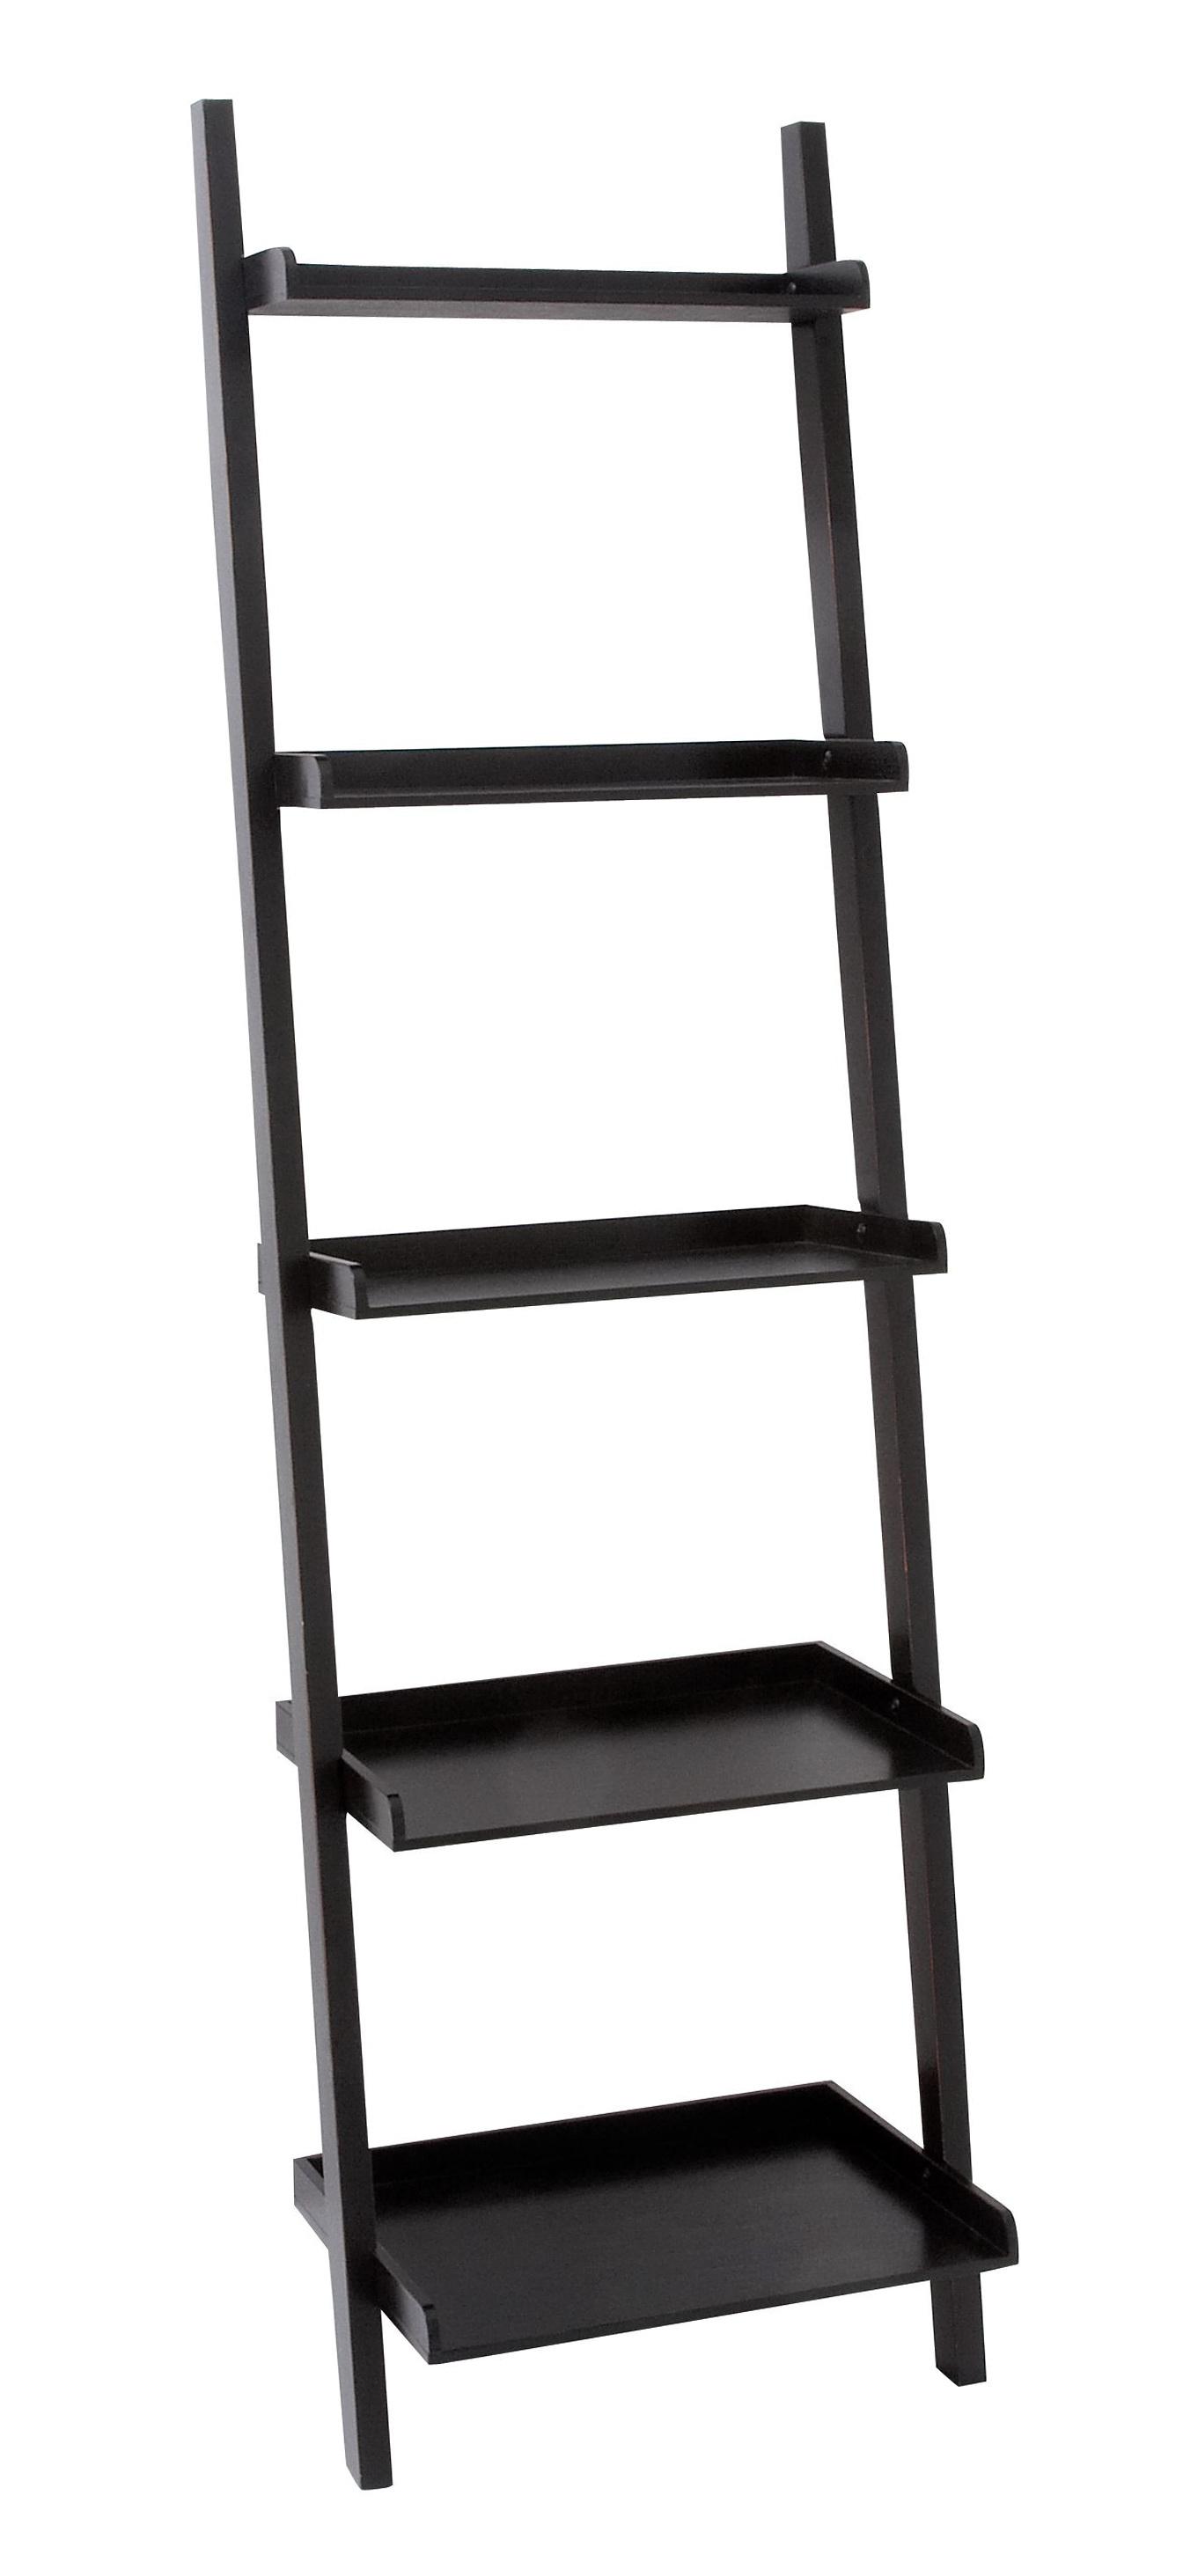 Leaning Wall Shelf Black